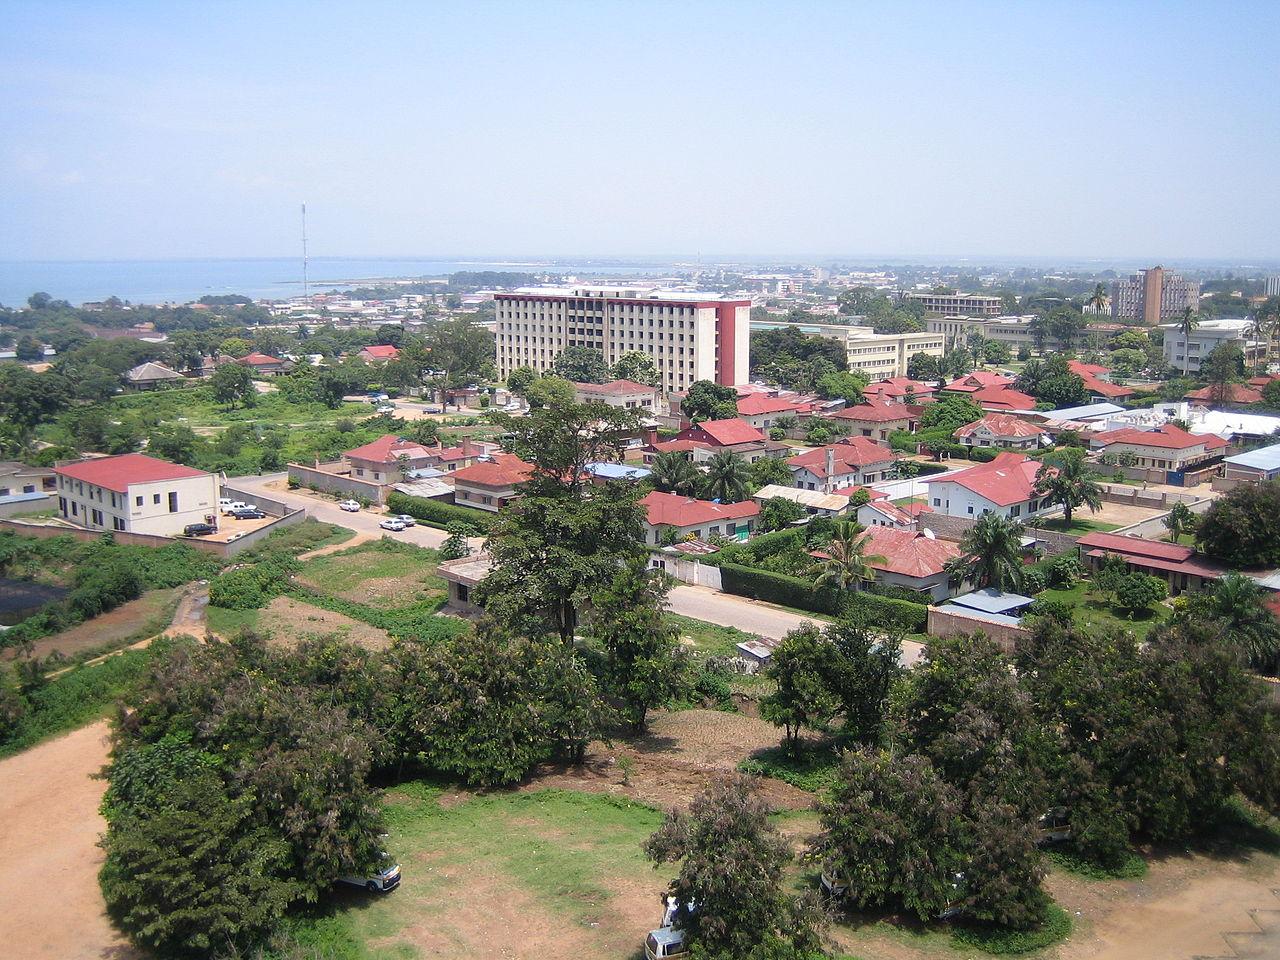 Pemandangan ibu kota Bujumbura pada 2006.